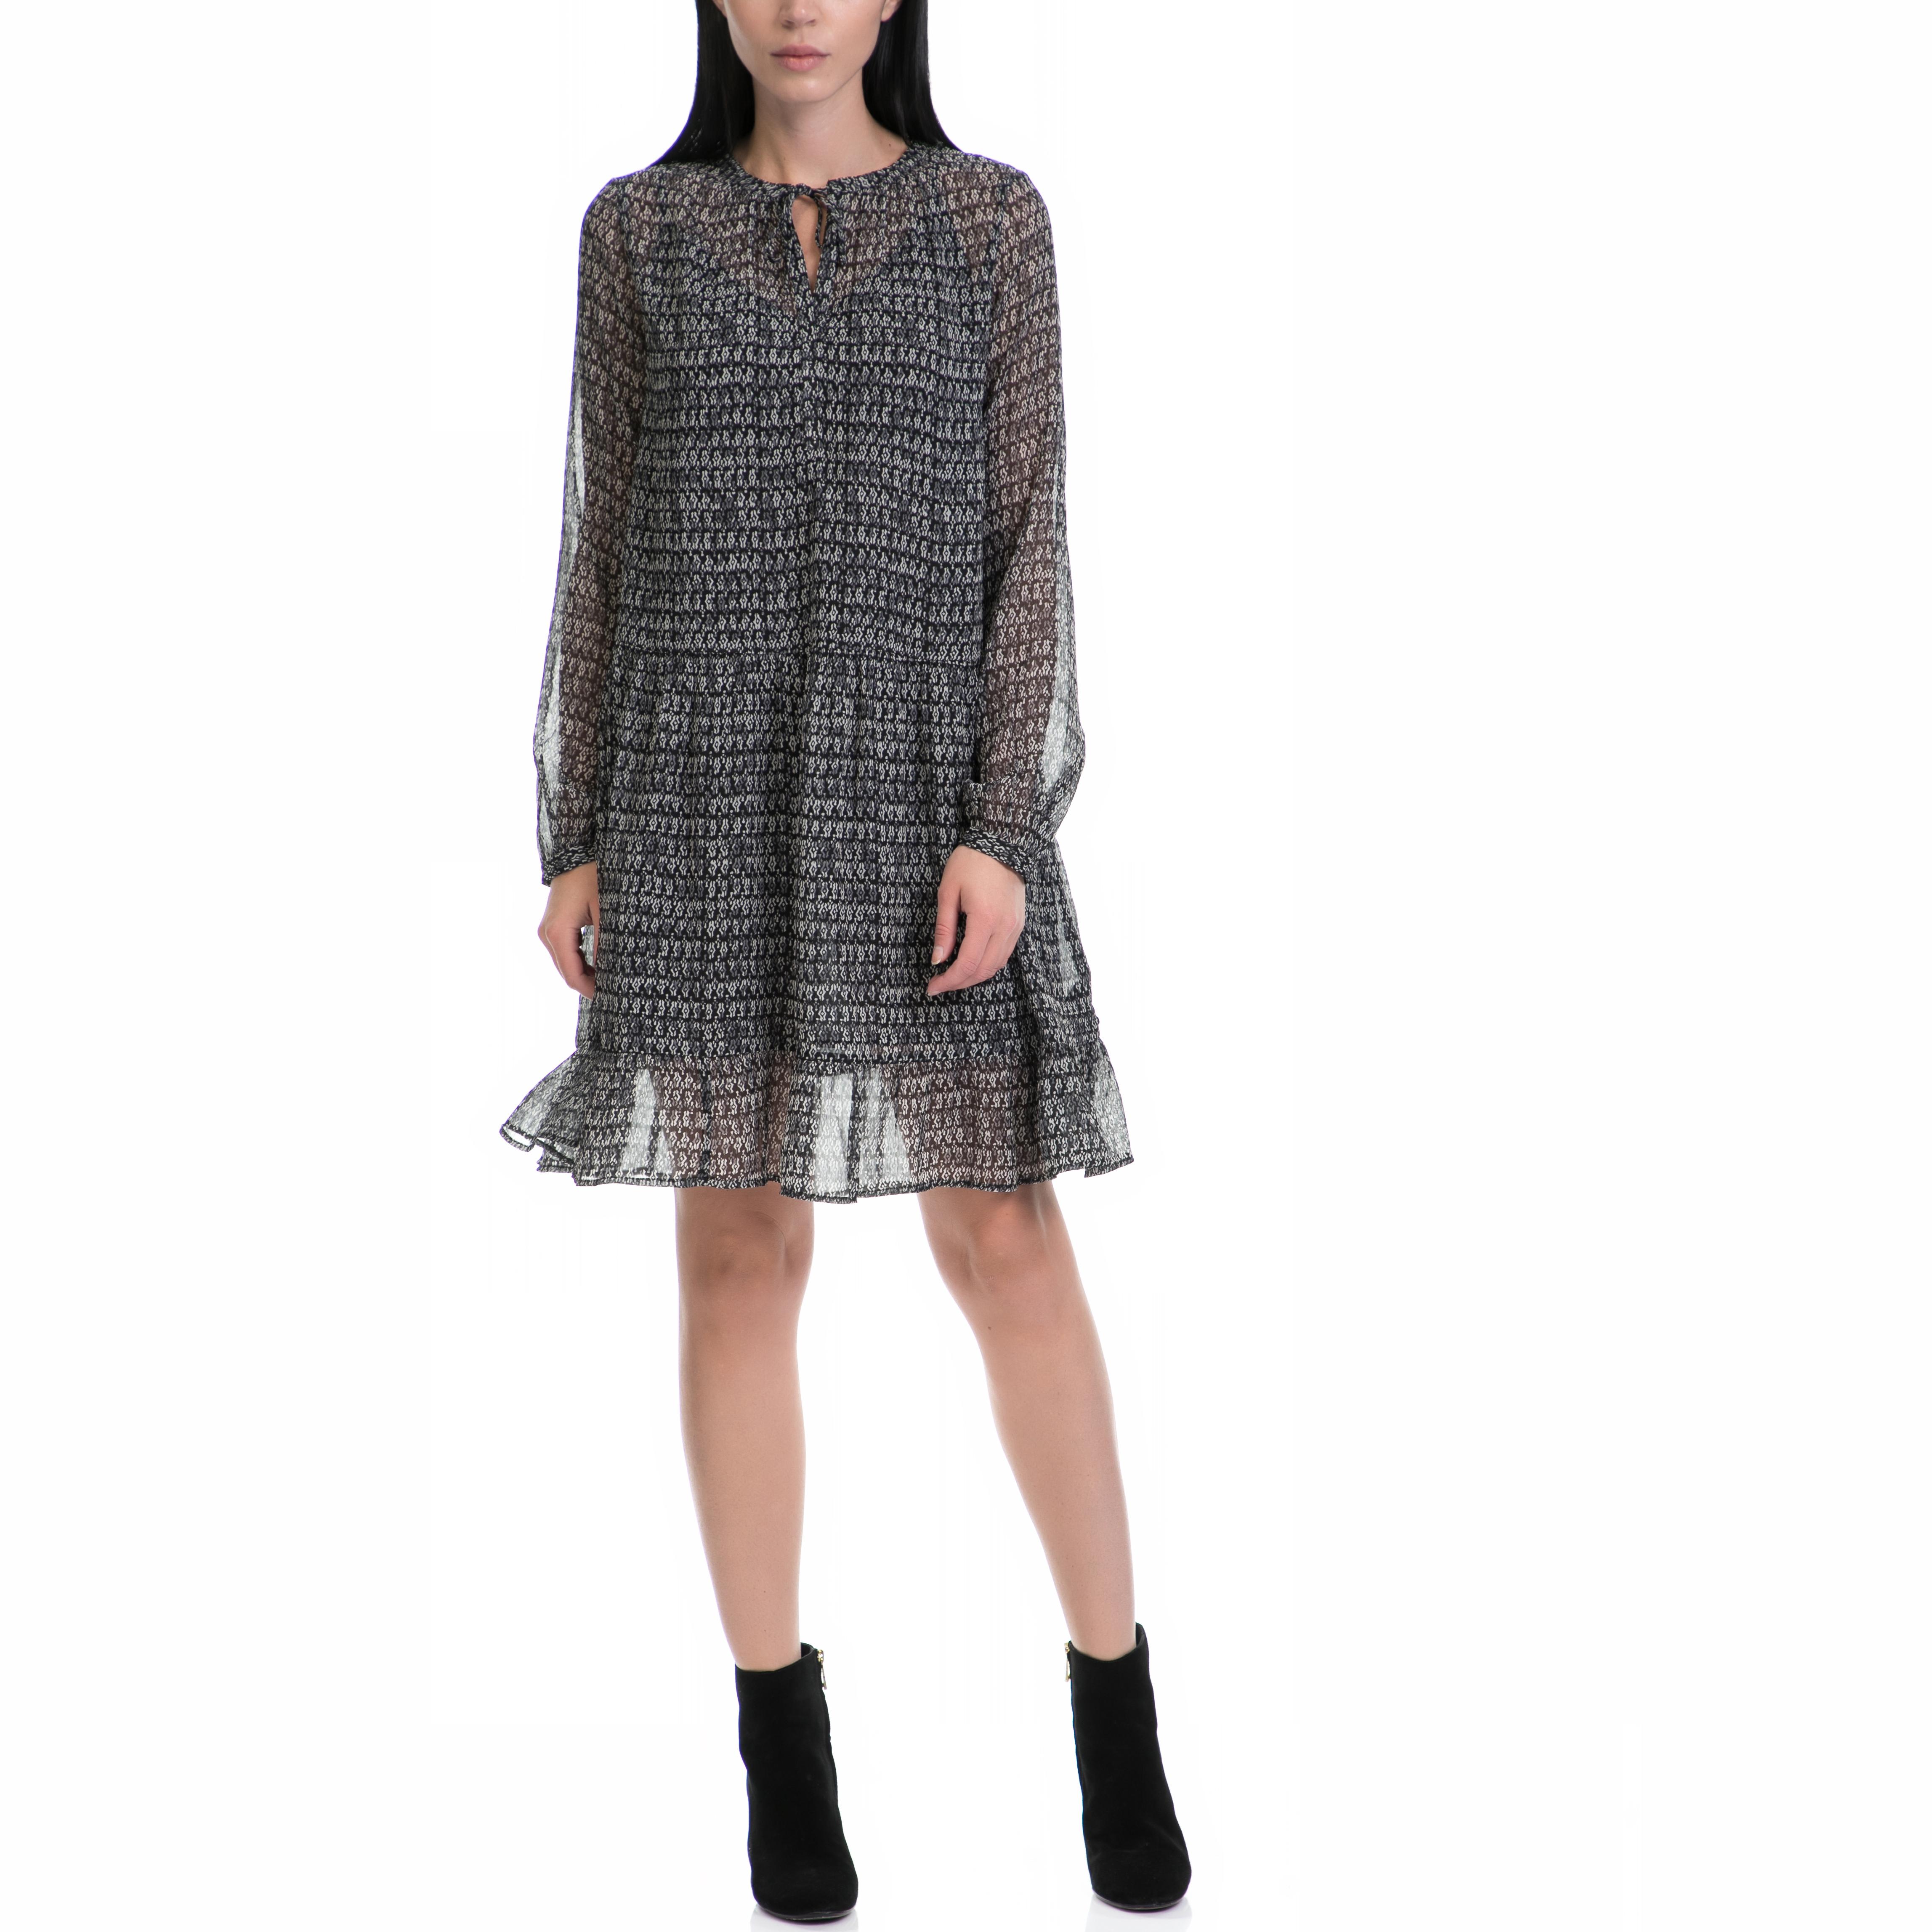 SCOTCH & SODA - Γυναικείο φόρεμα MAISON SCOTCH μαύρο-γκρι γυναικεία ρούχα φορέματα μέχρι το γόνατο